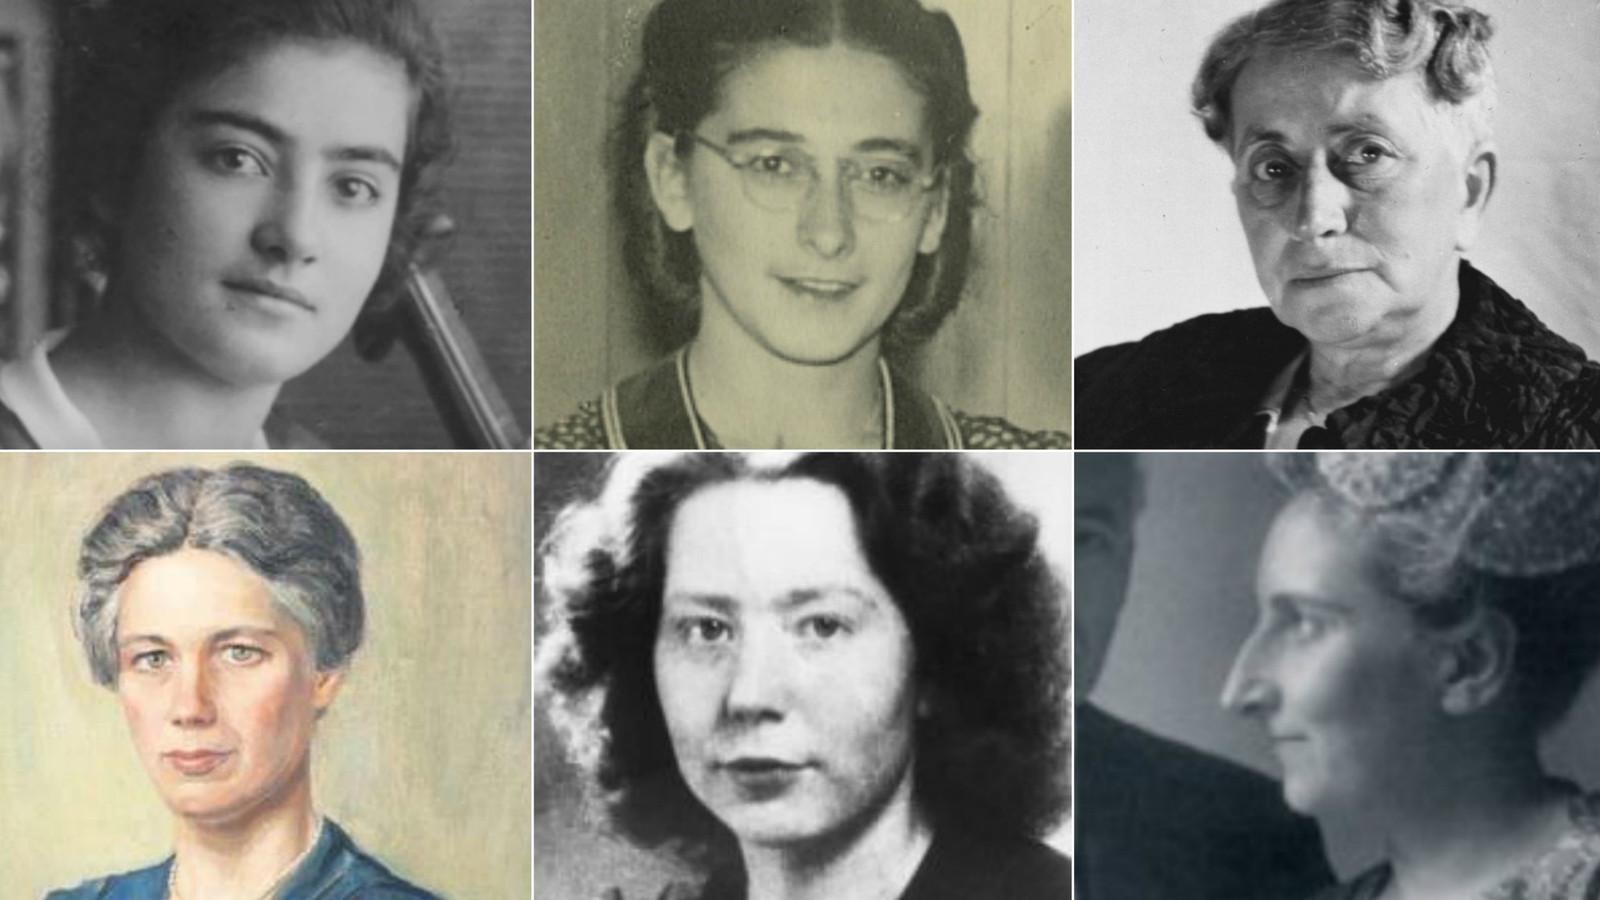 Verzetsheldinnen vlnr: Frieda Belinfante, Henriette Voute, Henriette Pimentel, Jacoba van Tongeren, Hannie Schaft en Hester van Lennep.